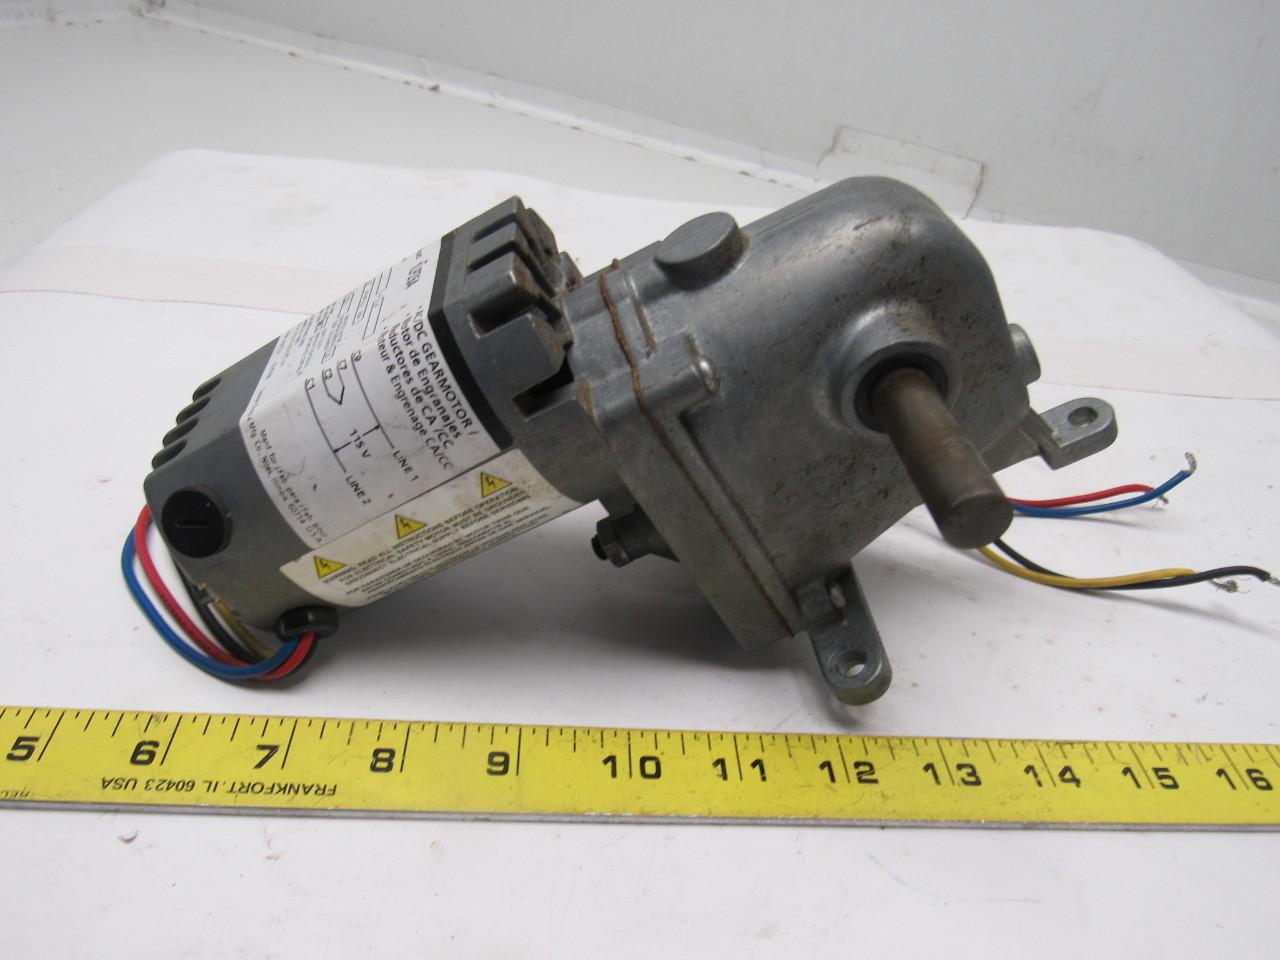 Dayton 1lpz6a ac dc right angle gear motor 115v 1 4a for Dc right angle gear motor